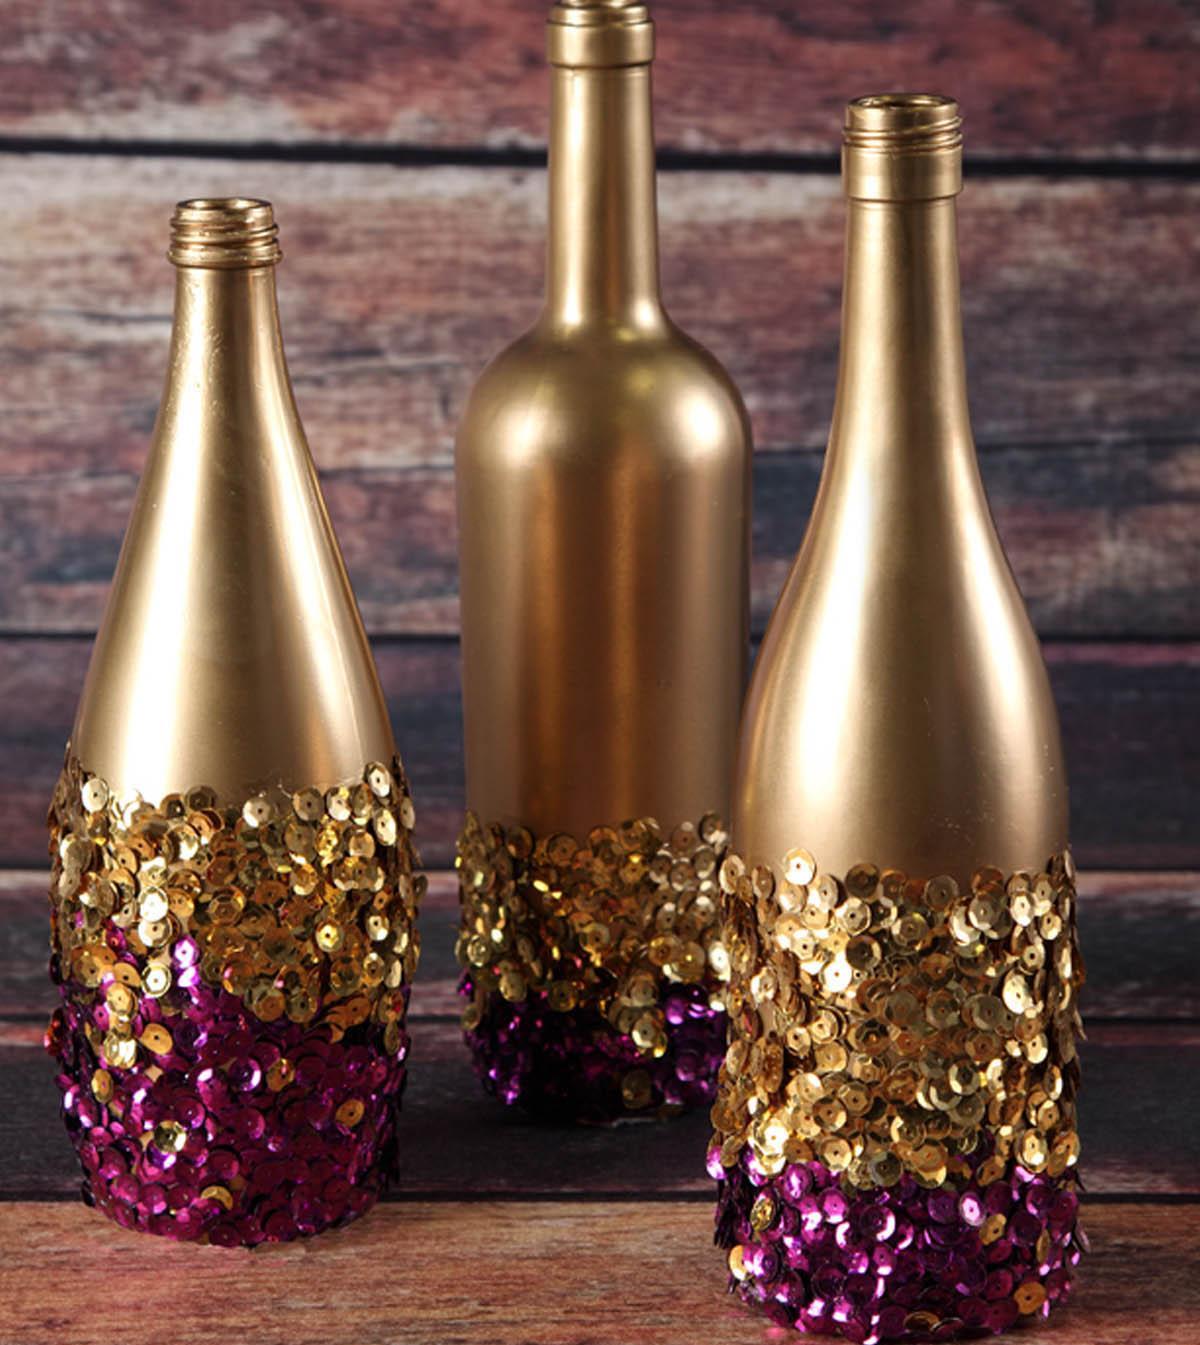 Cat Golden dan Sequins dalam Hiasan Botol